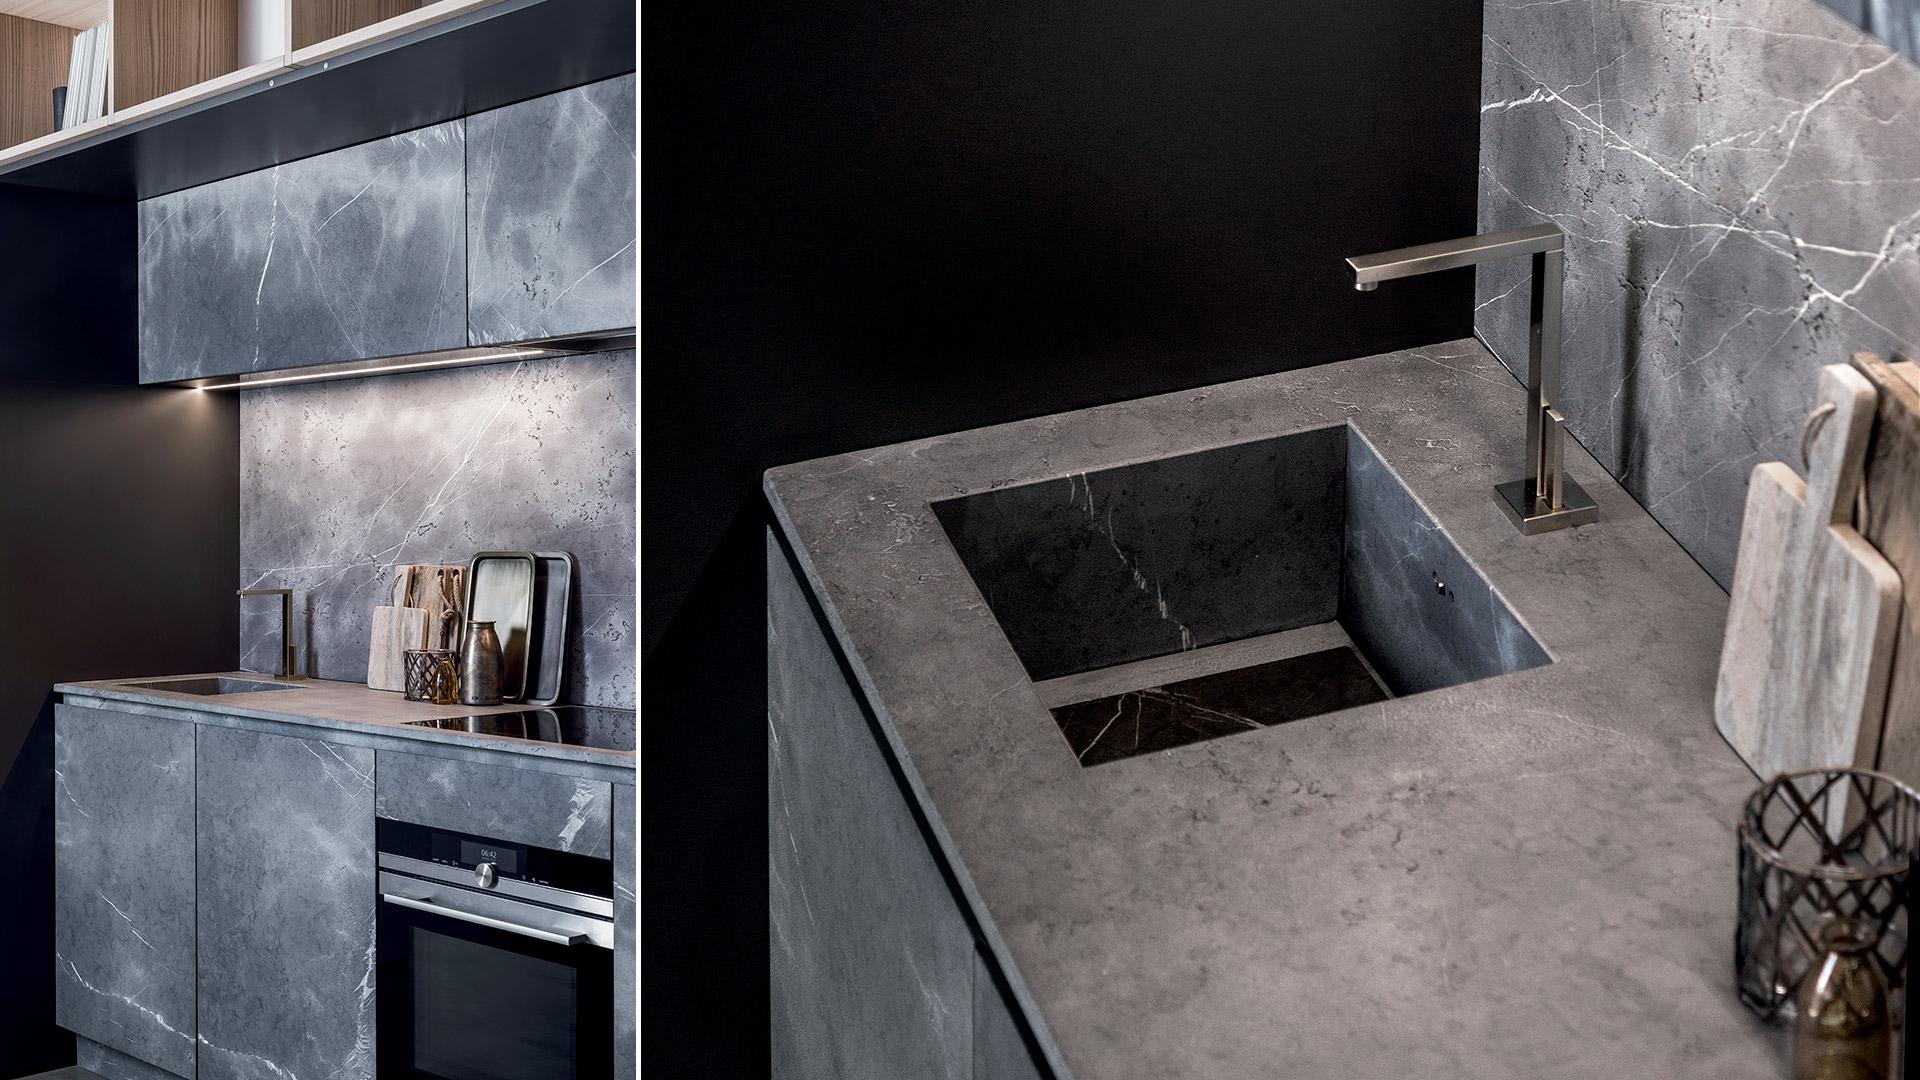 Corinthian stone kitchen with wood elm - TM_LN17_LAUREN_003